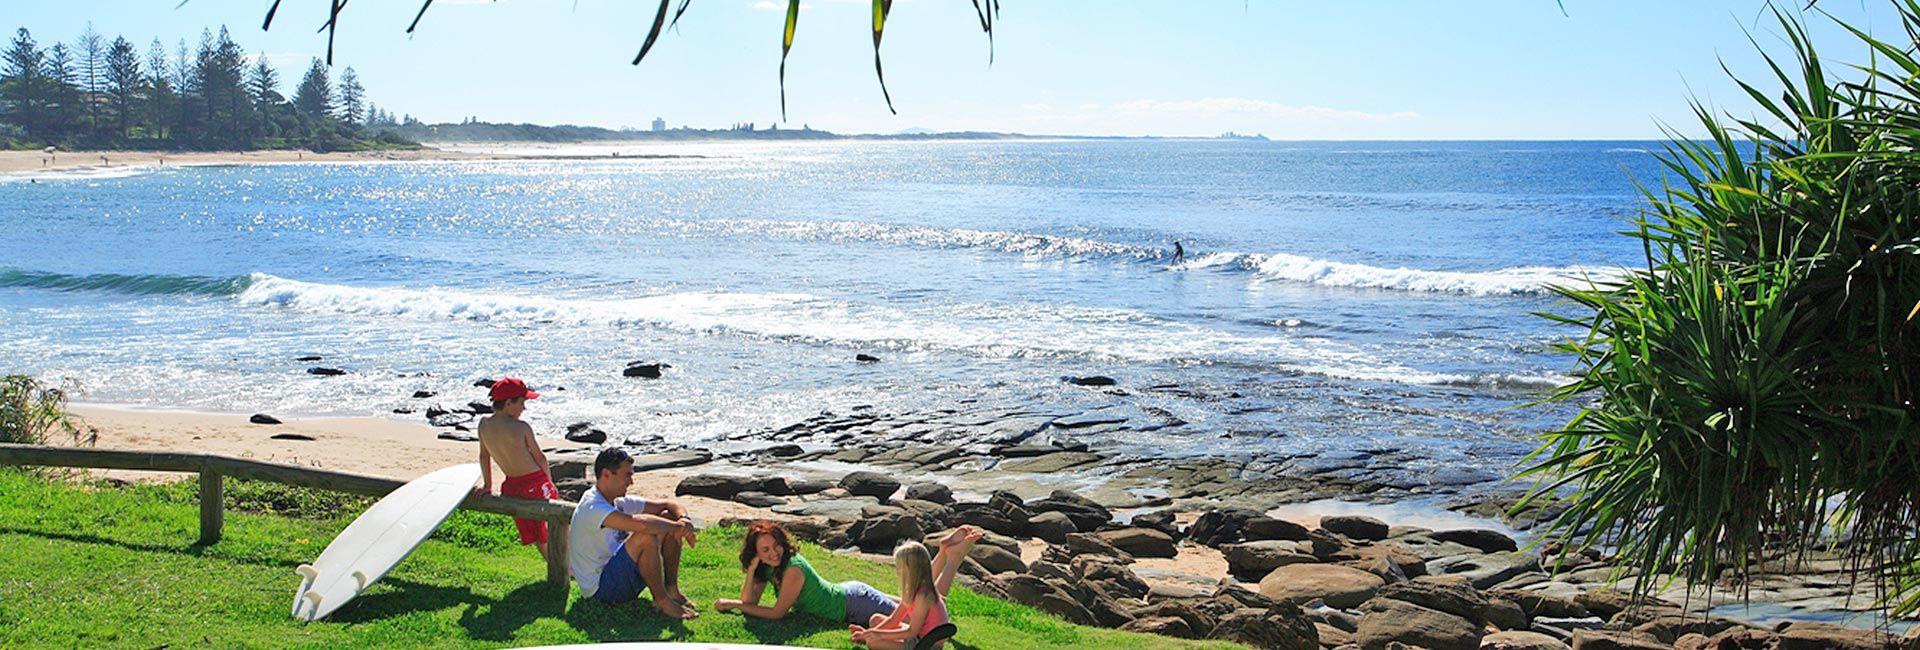 Kings Beach Caloundra Sunshine Coast Caloundra